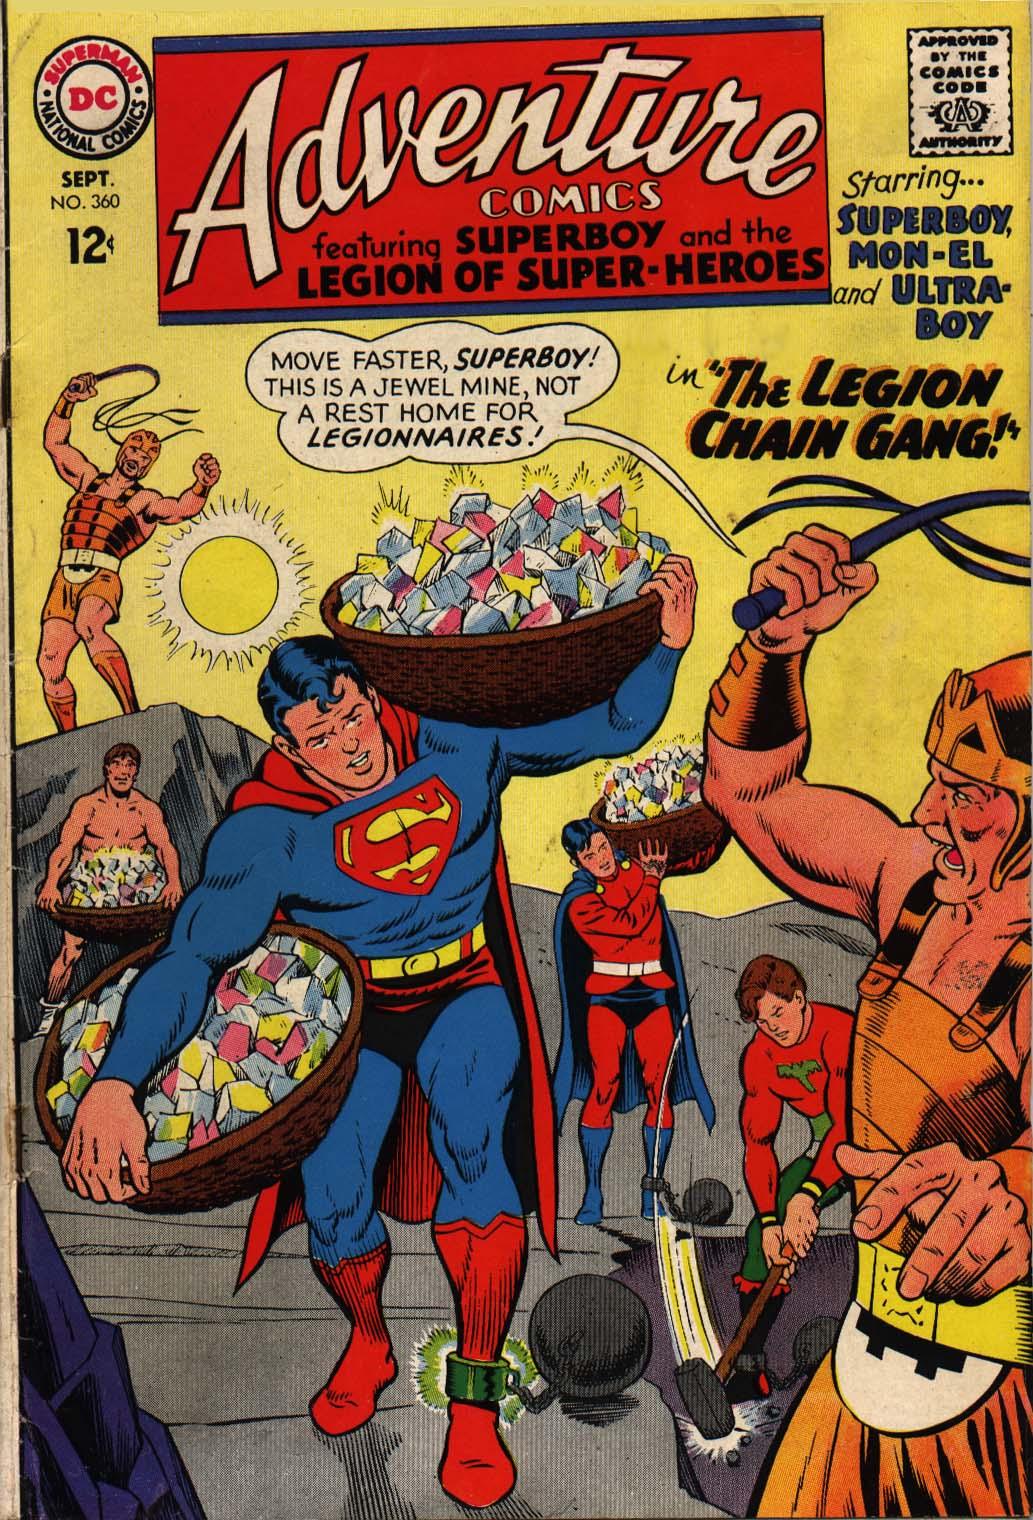 Read online Adventure Comics (1938) comic -  Issue #360 - 1